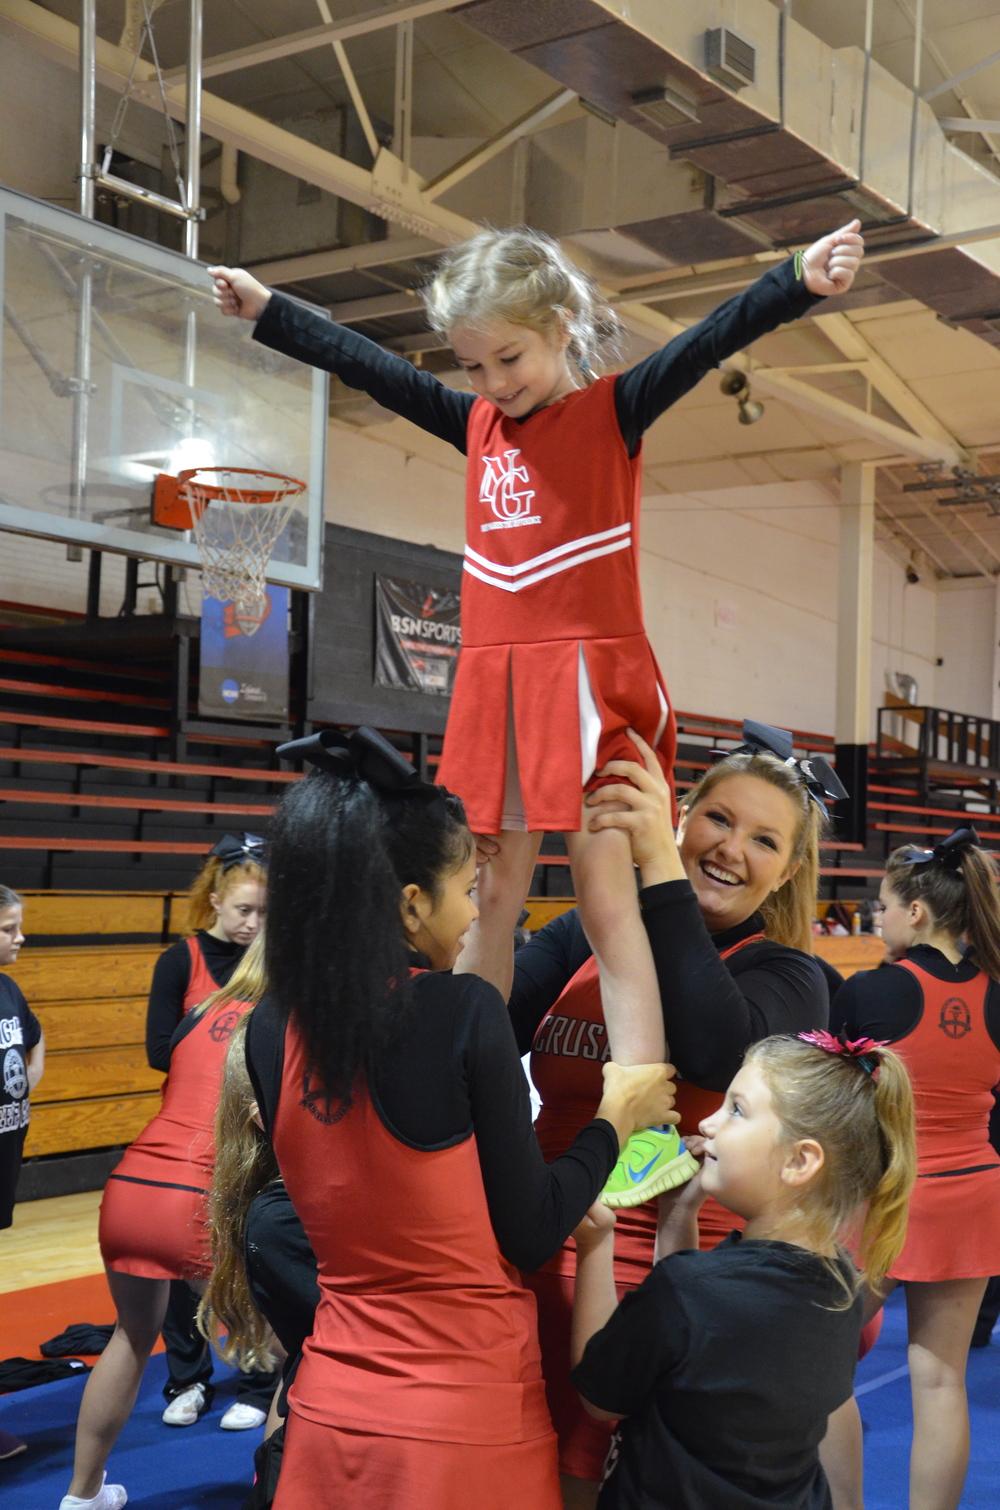 A little girl getting big help to be like the cheerleaders